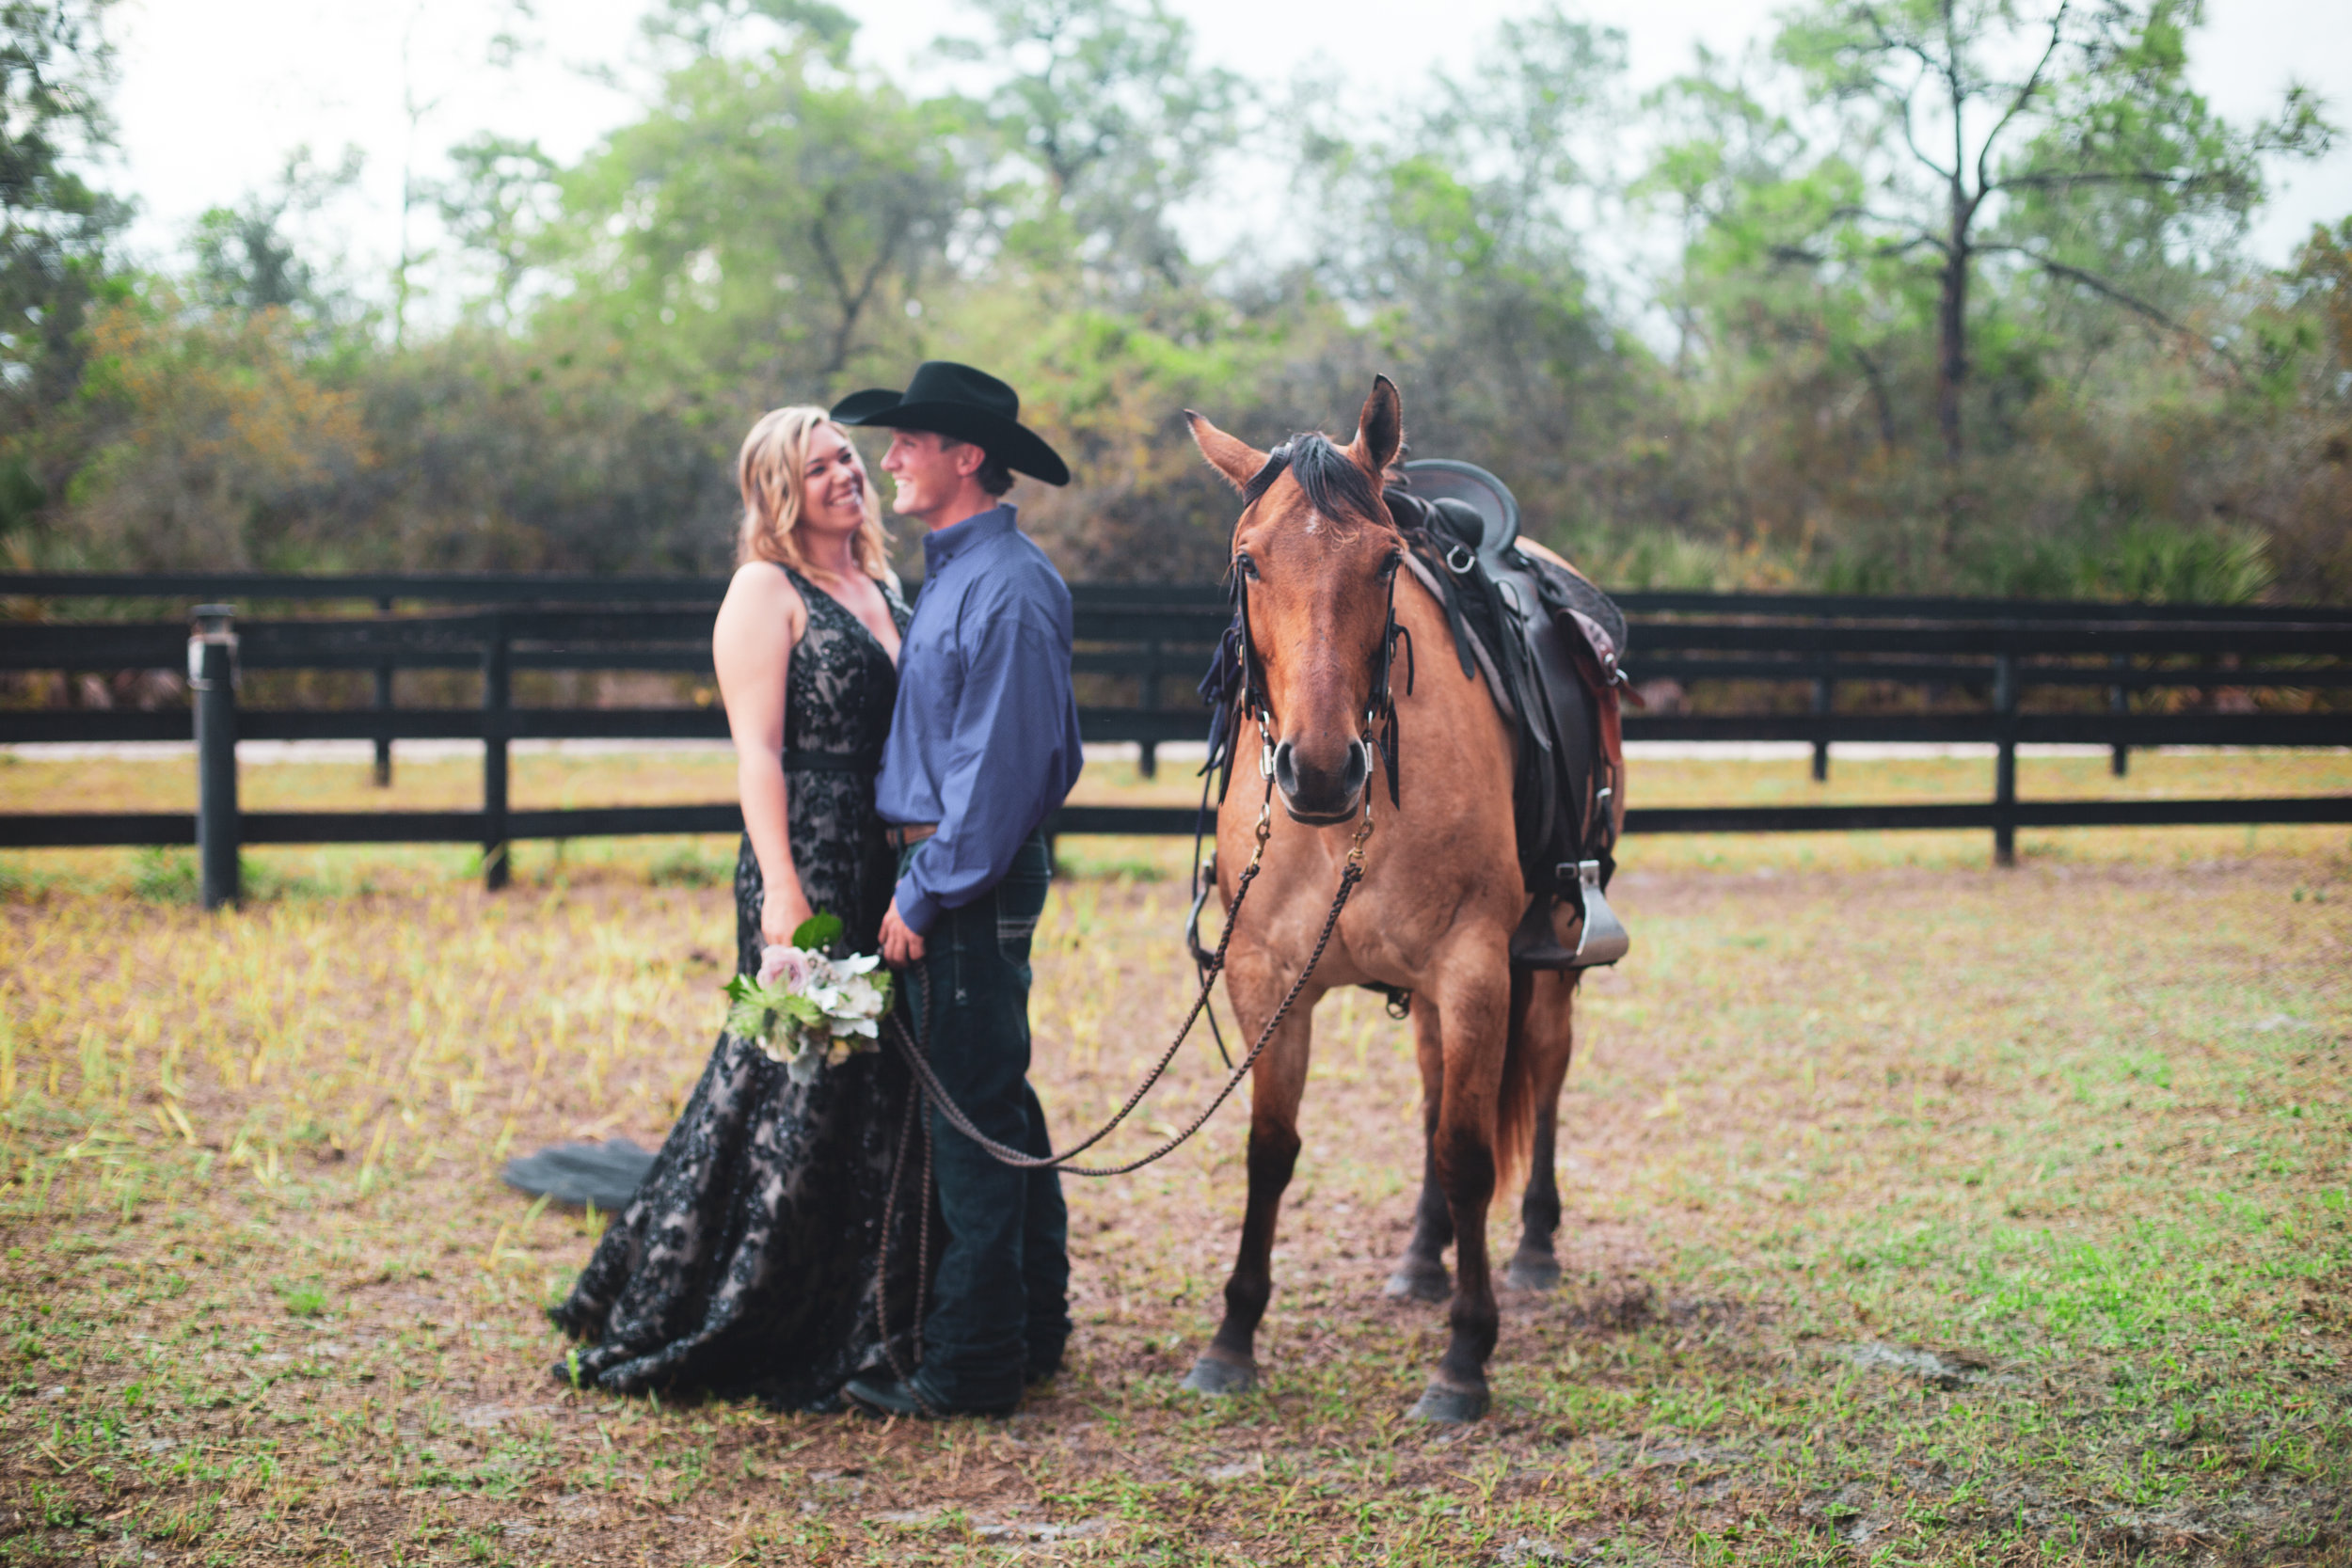 kelilina photography and films florida wedding photography videography 015-5.jpg